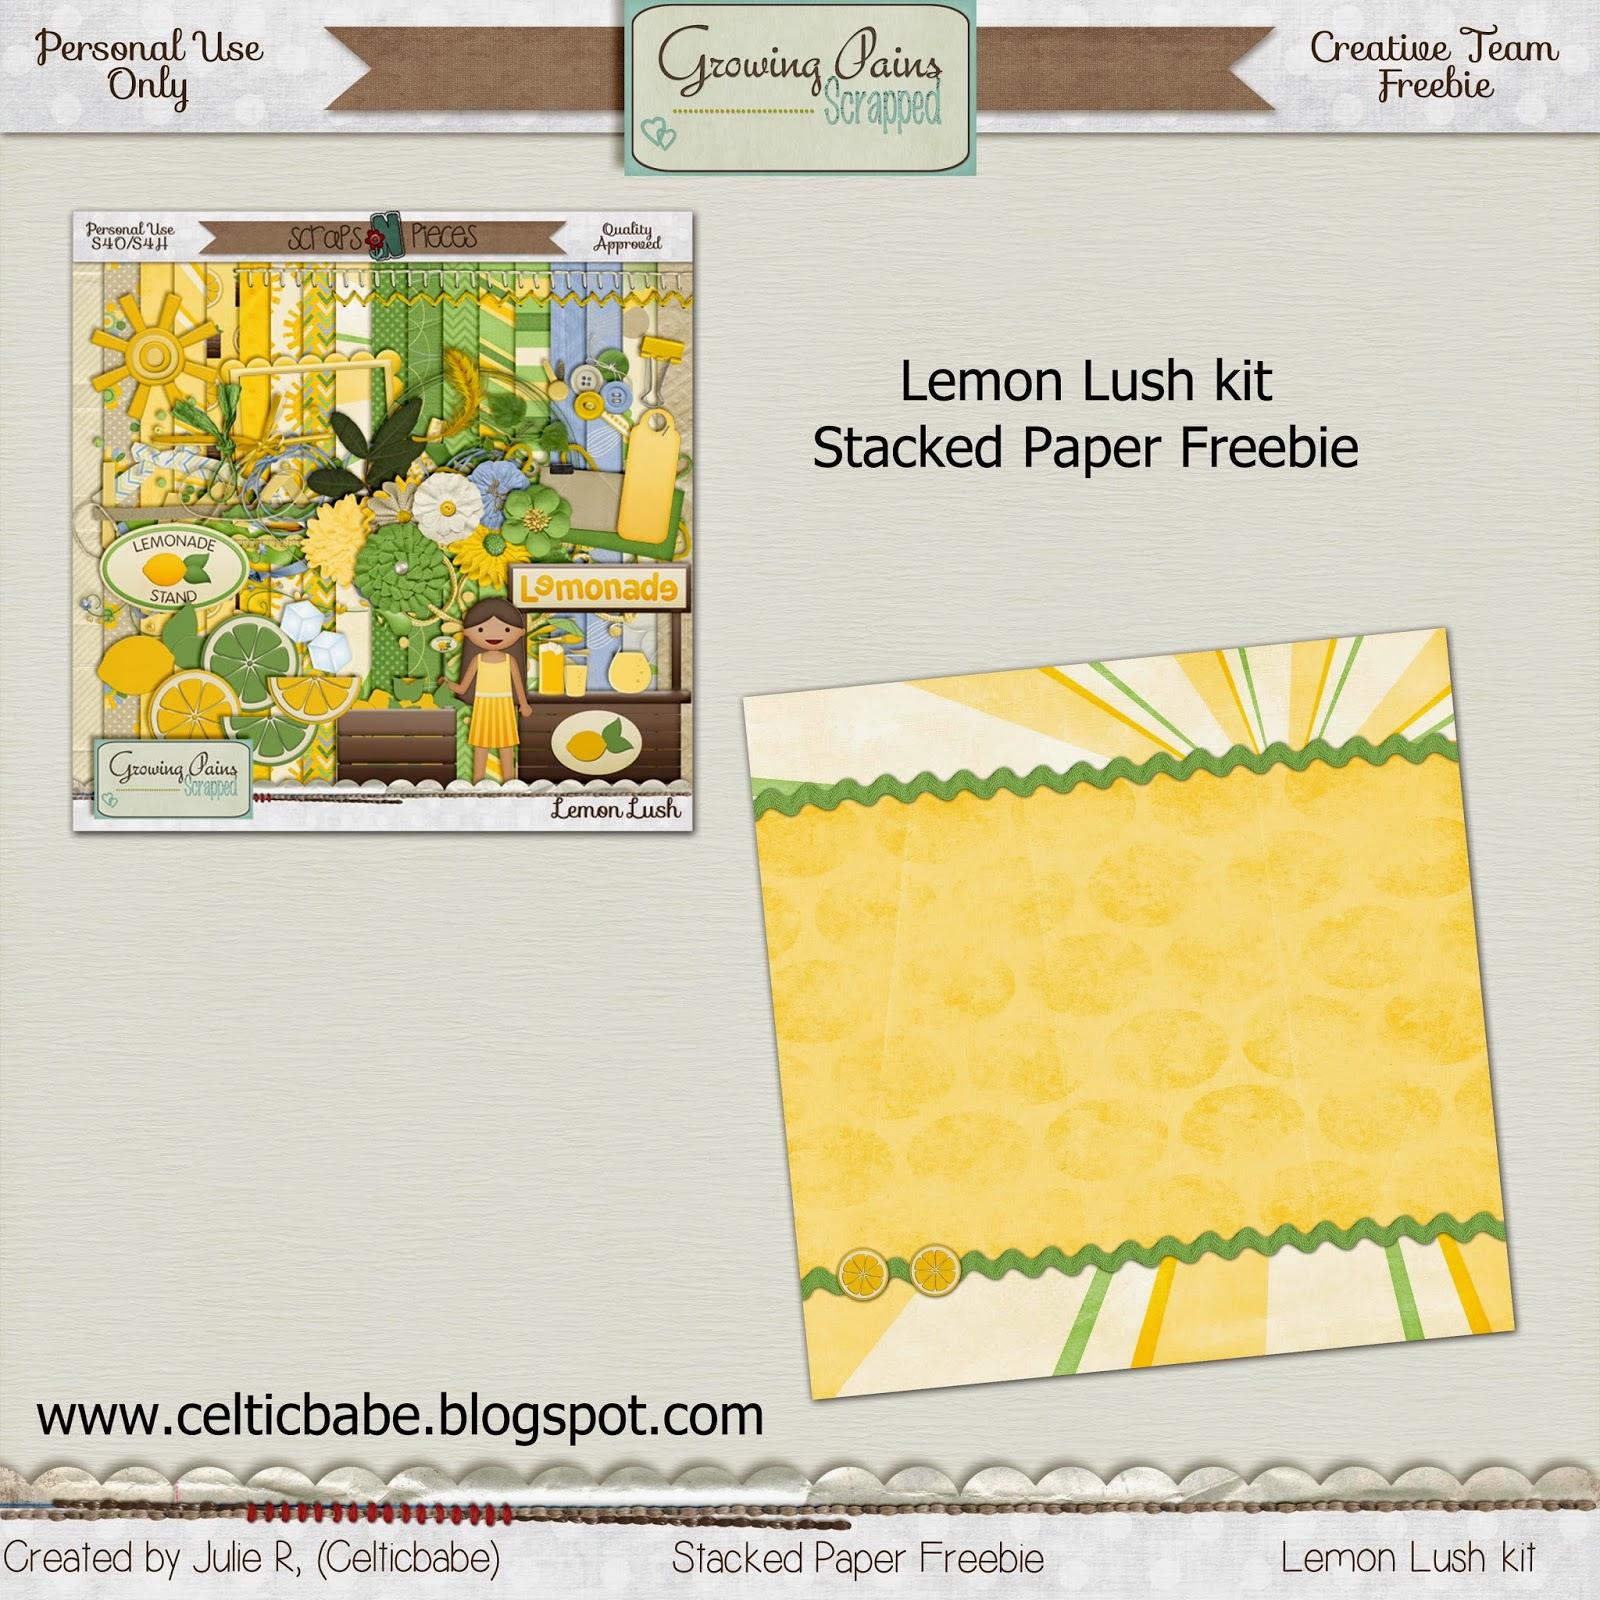 http://1.bp.blogspot.com/-04skPAbcEF4/U2G7Dz6qLXI/AAAAAAAABS4/TEsgiNE7T30/s1600/Lemon+Lush+Freebie+Preview.jpg